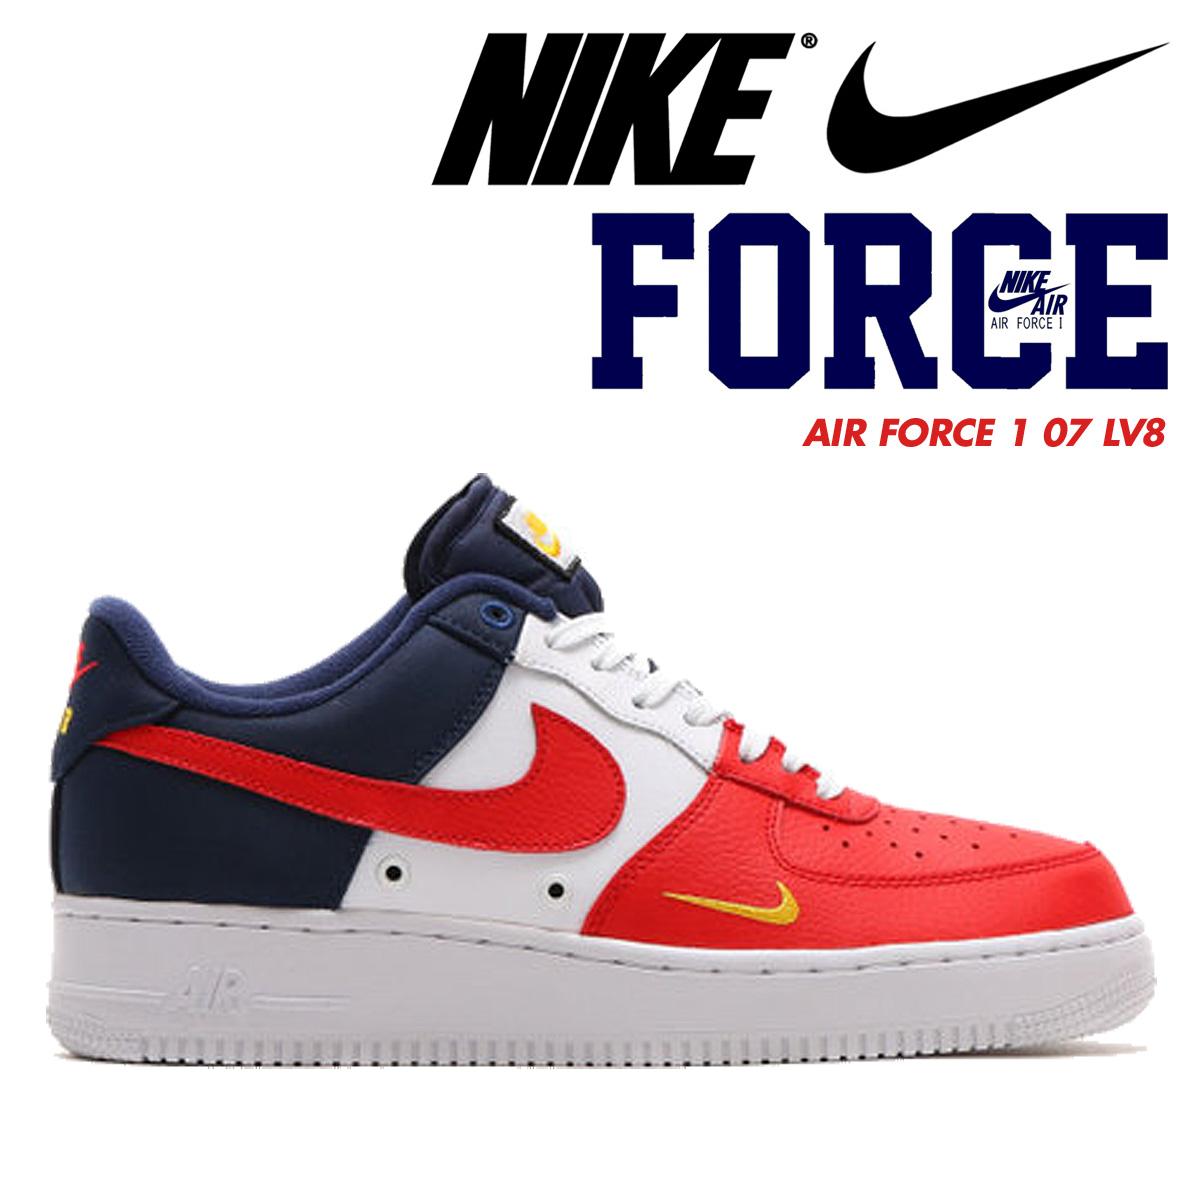 air force 1 low 07 lv8